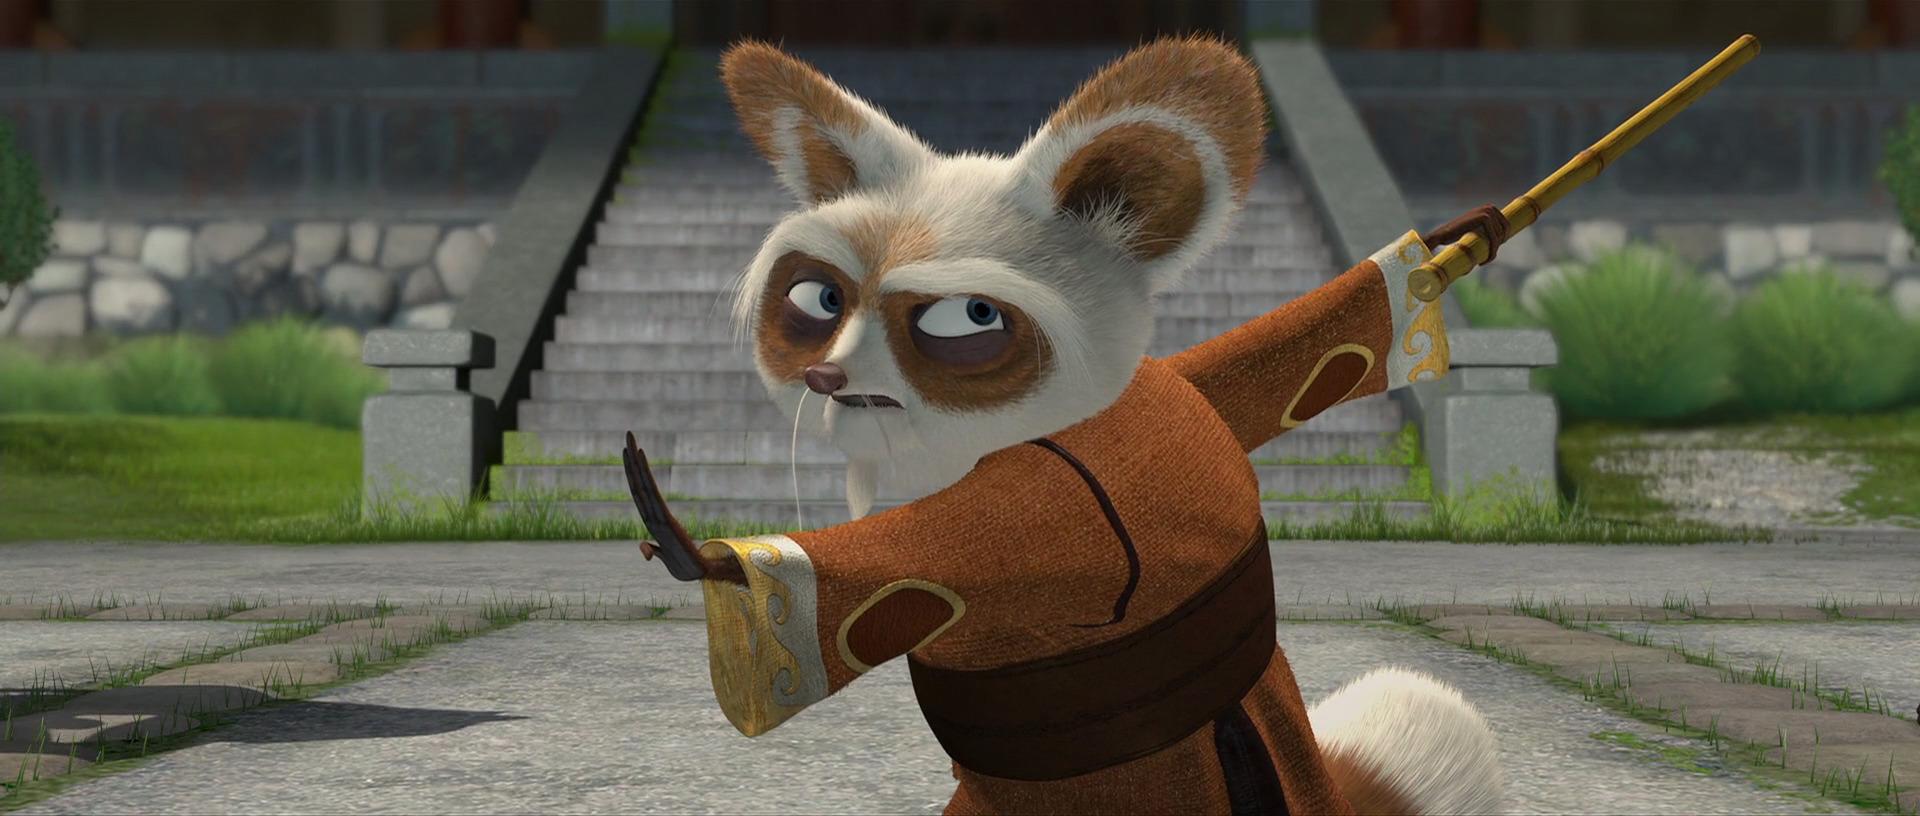 Red panda style kung fu panda wiki the online - Kung fu panda shifu ...